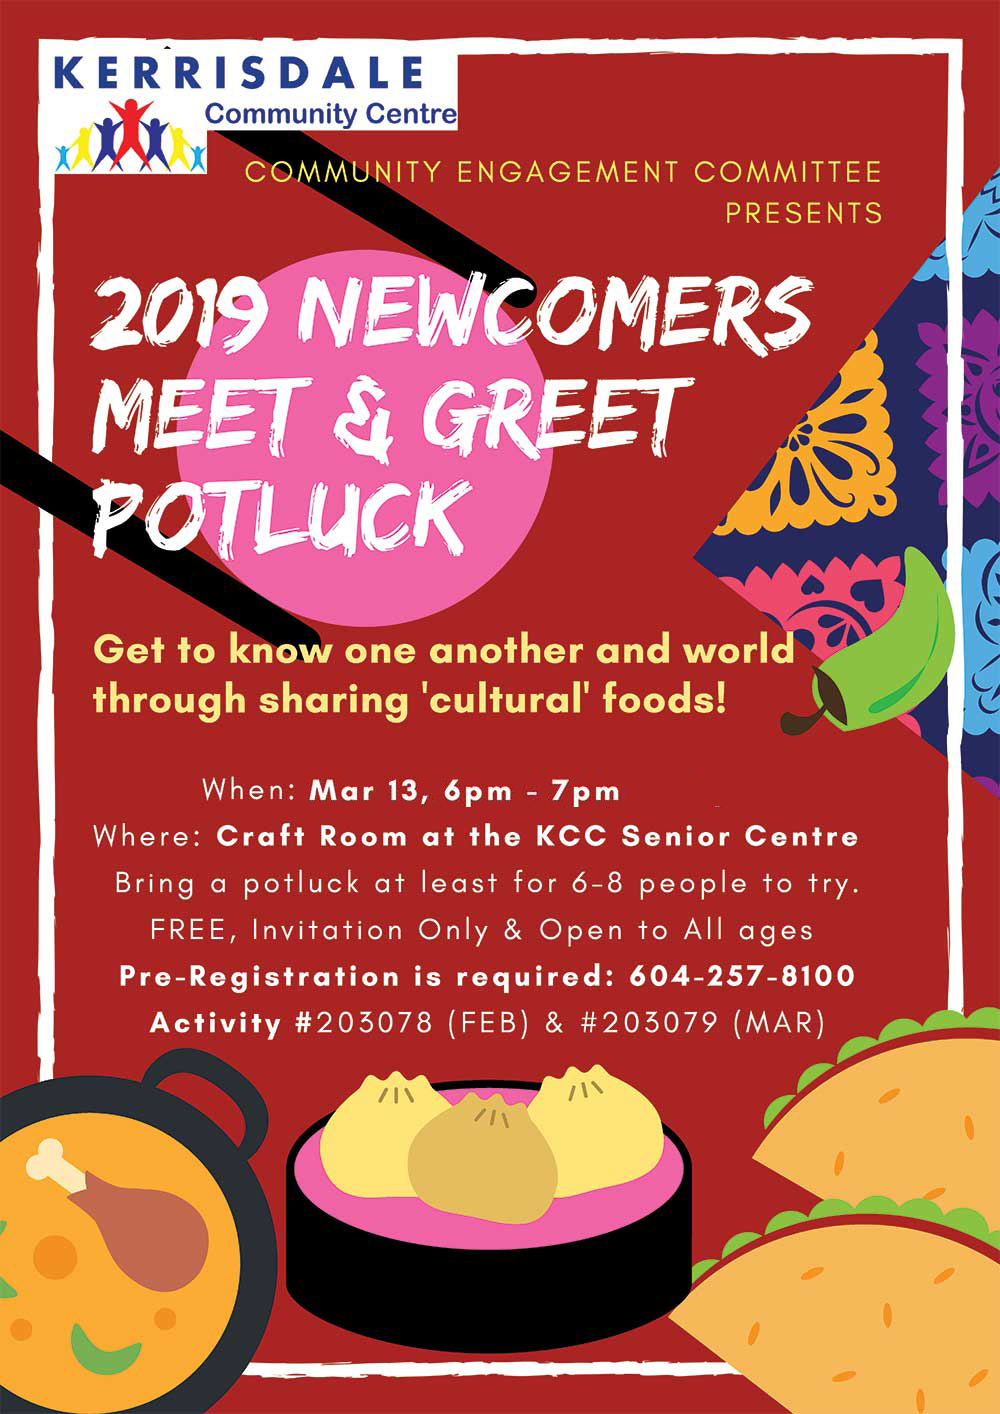 Newcomers Meet & Greet Potluck-Feb13,Mar13